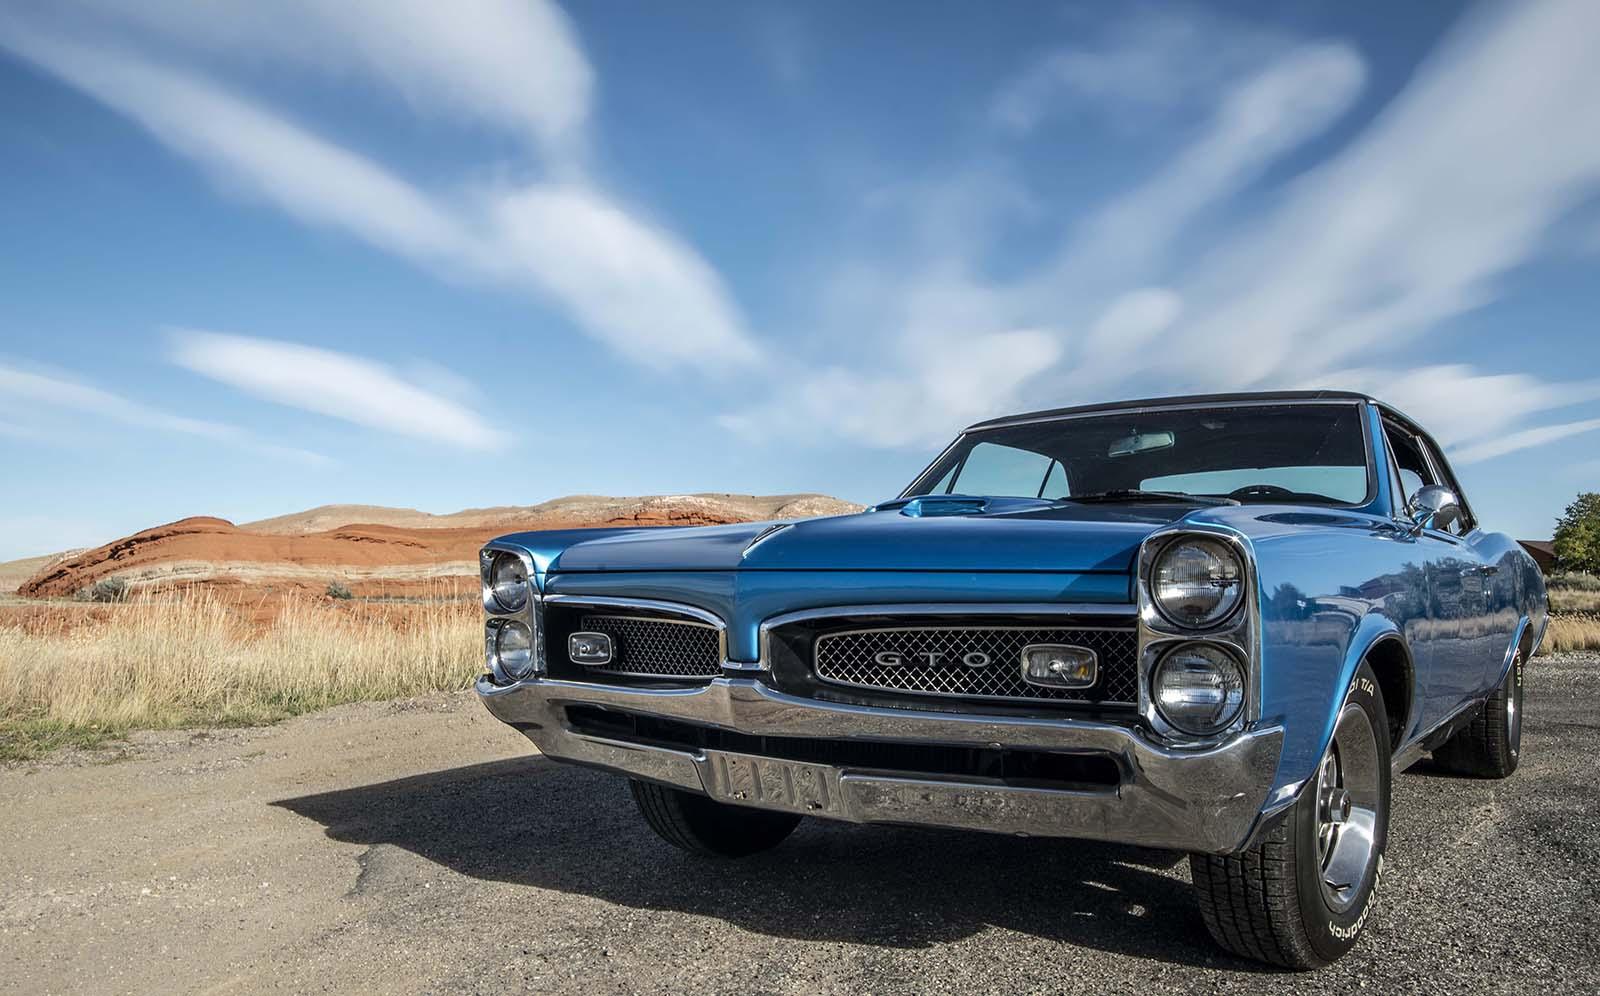 Pontiac GTO raffle car. Photo by Spencer Smith.